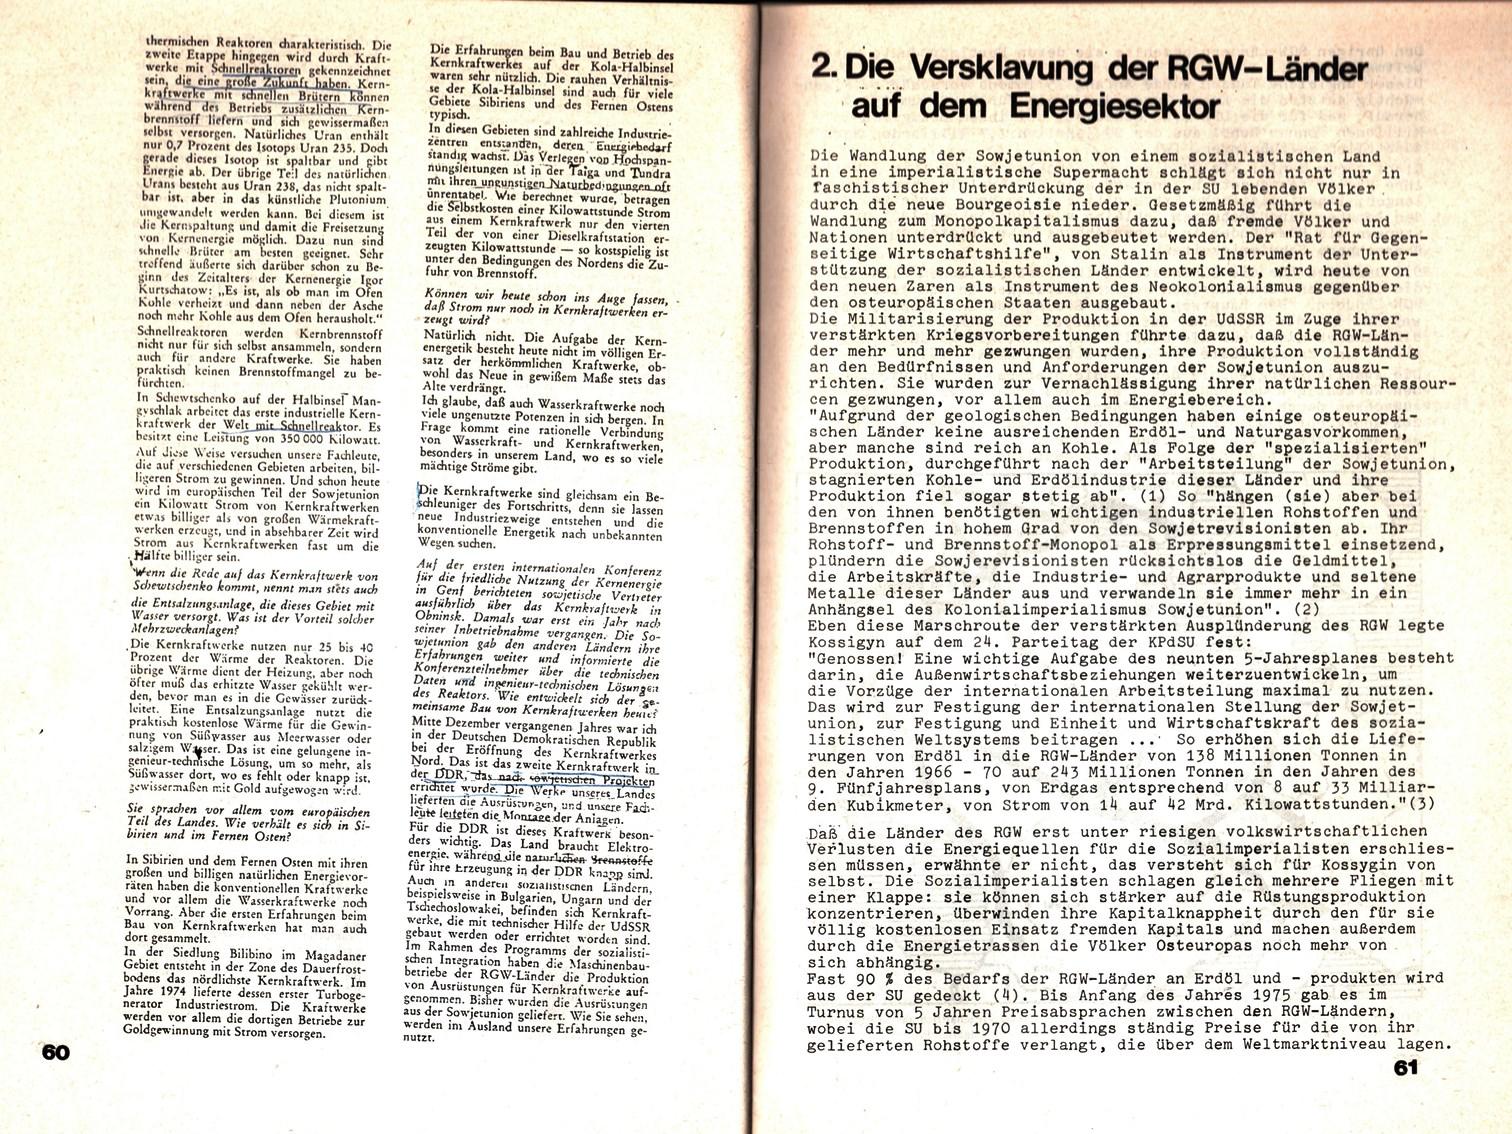 KSV_1976_Atomenergie_im_Kapitalismus_032